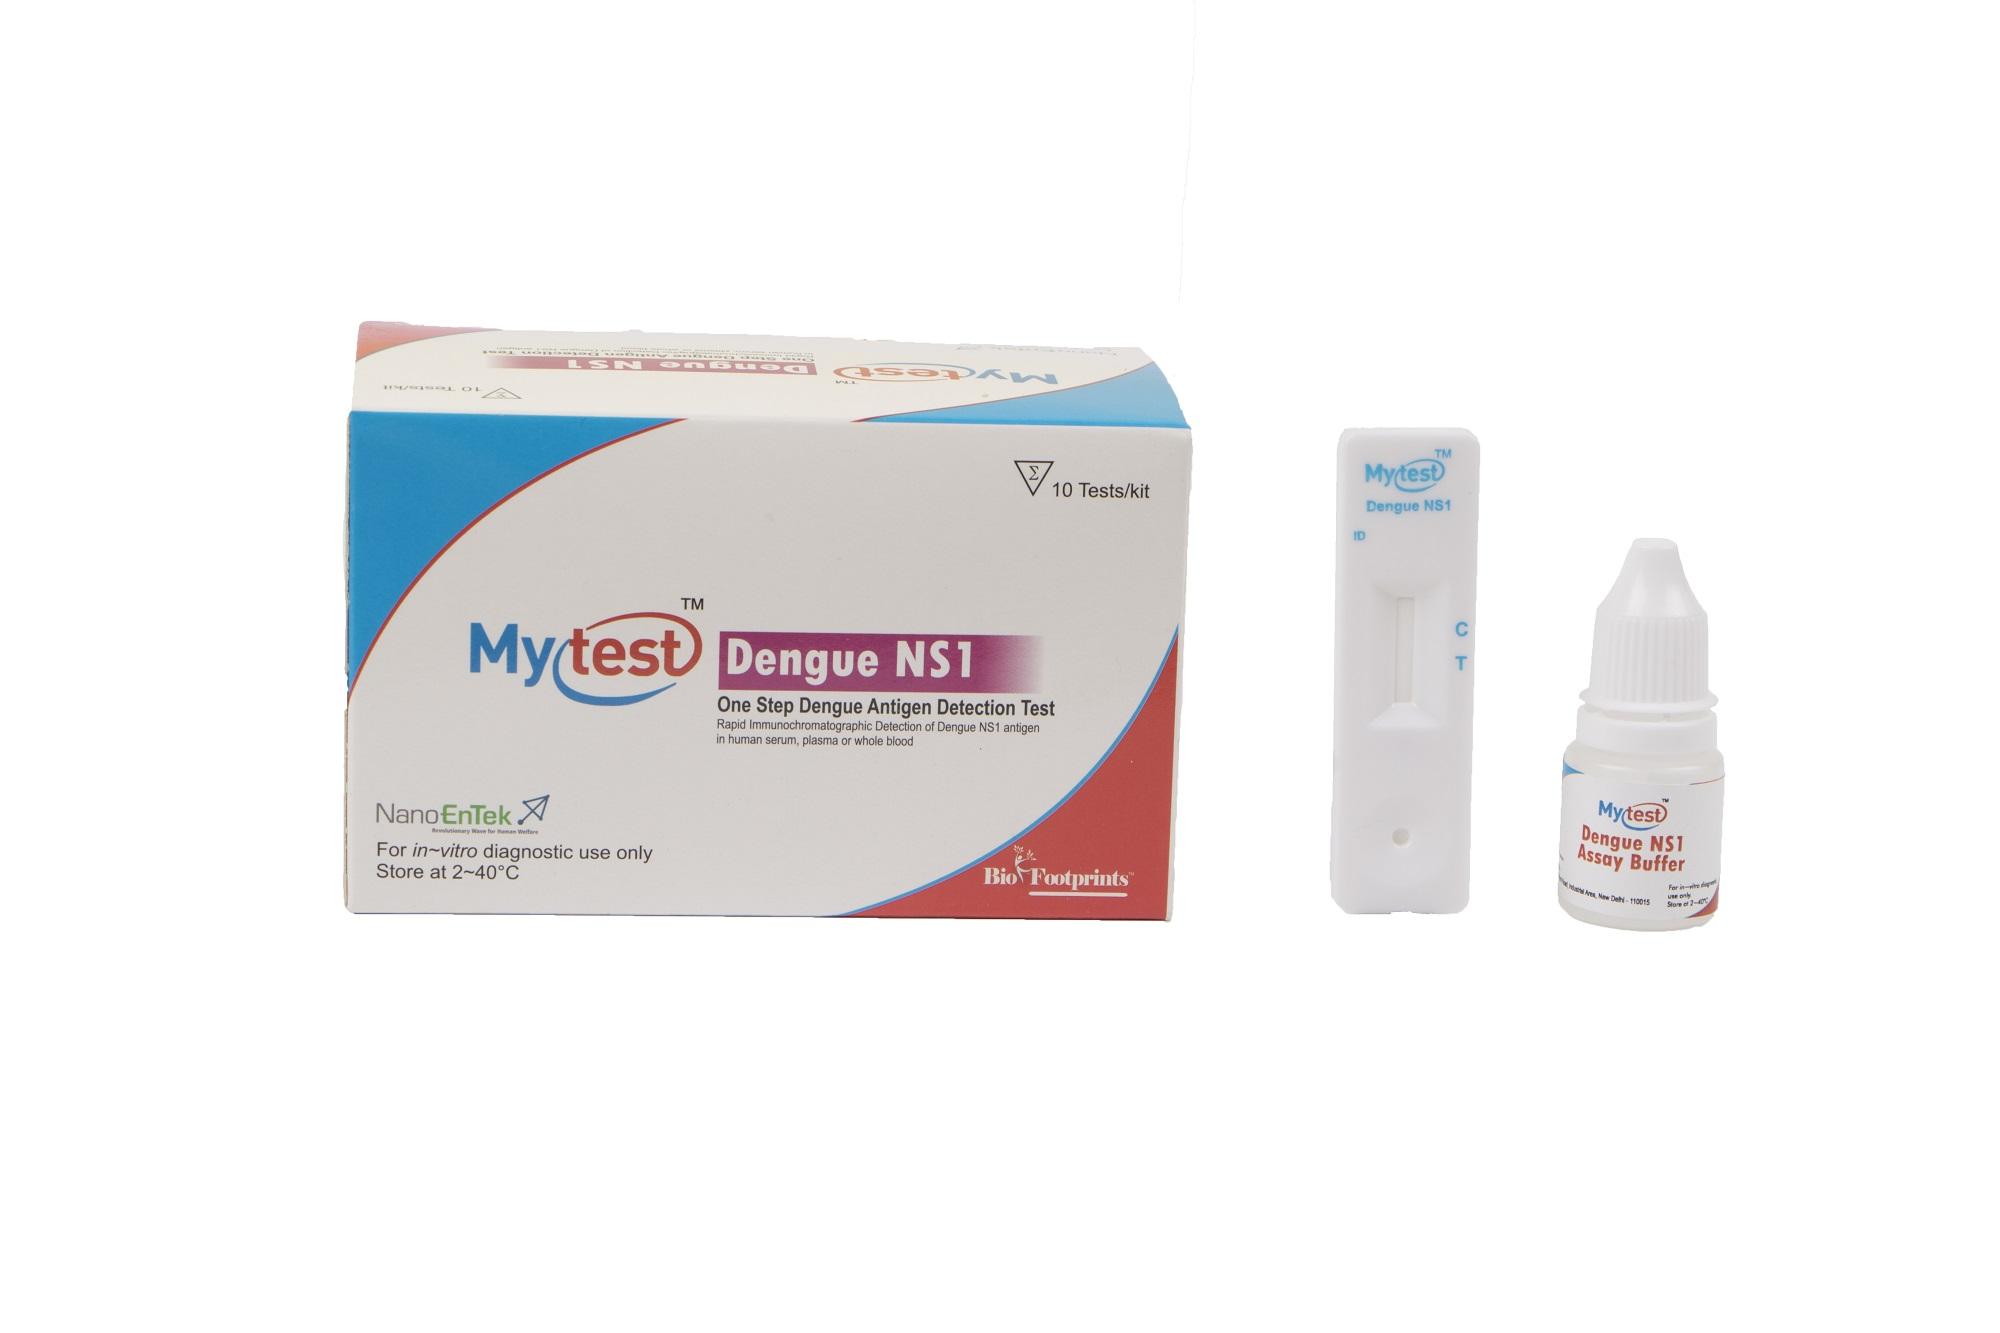 Mytest Dengue NS1